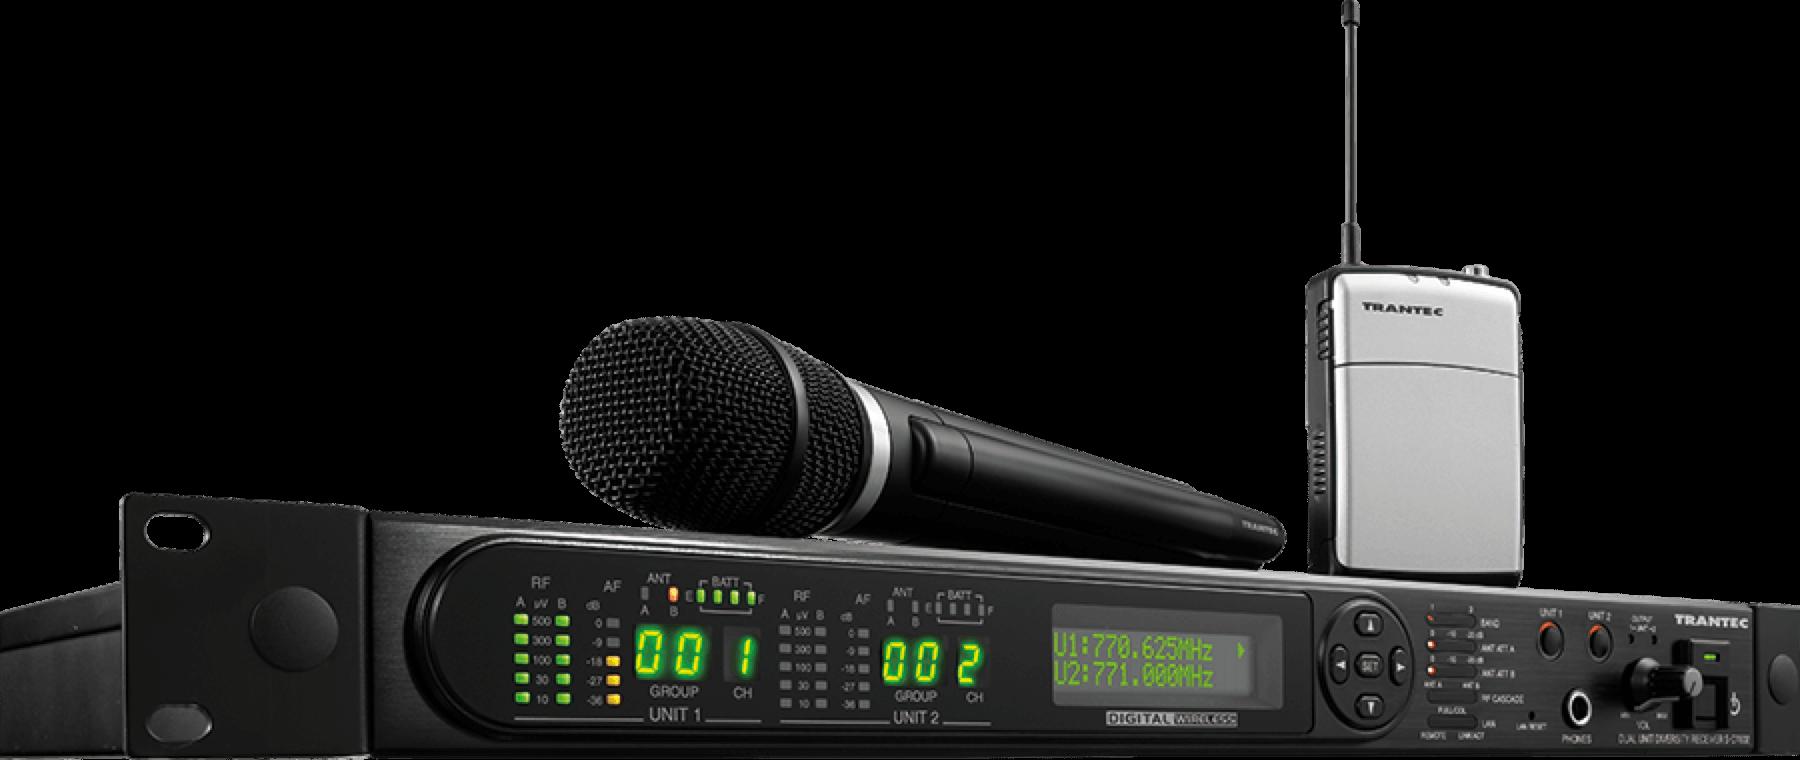 Trantec S 4.04L-EB  Tie pin Radio-Wireless microphone system  New version Ch 70